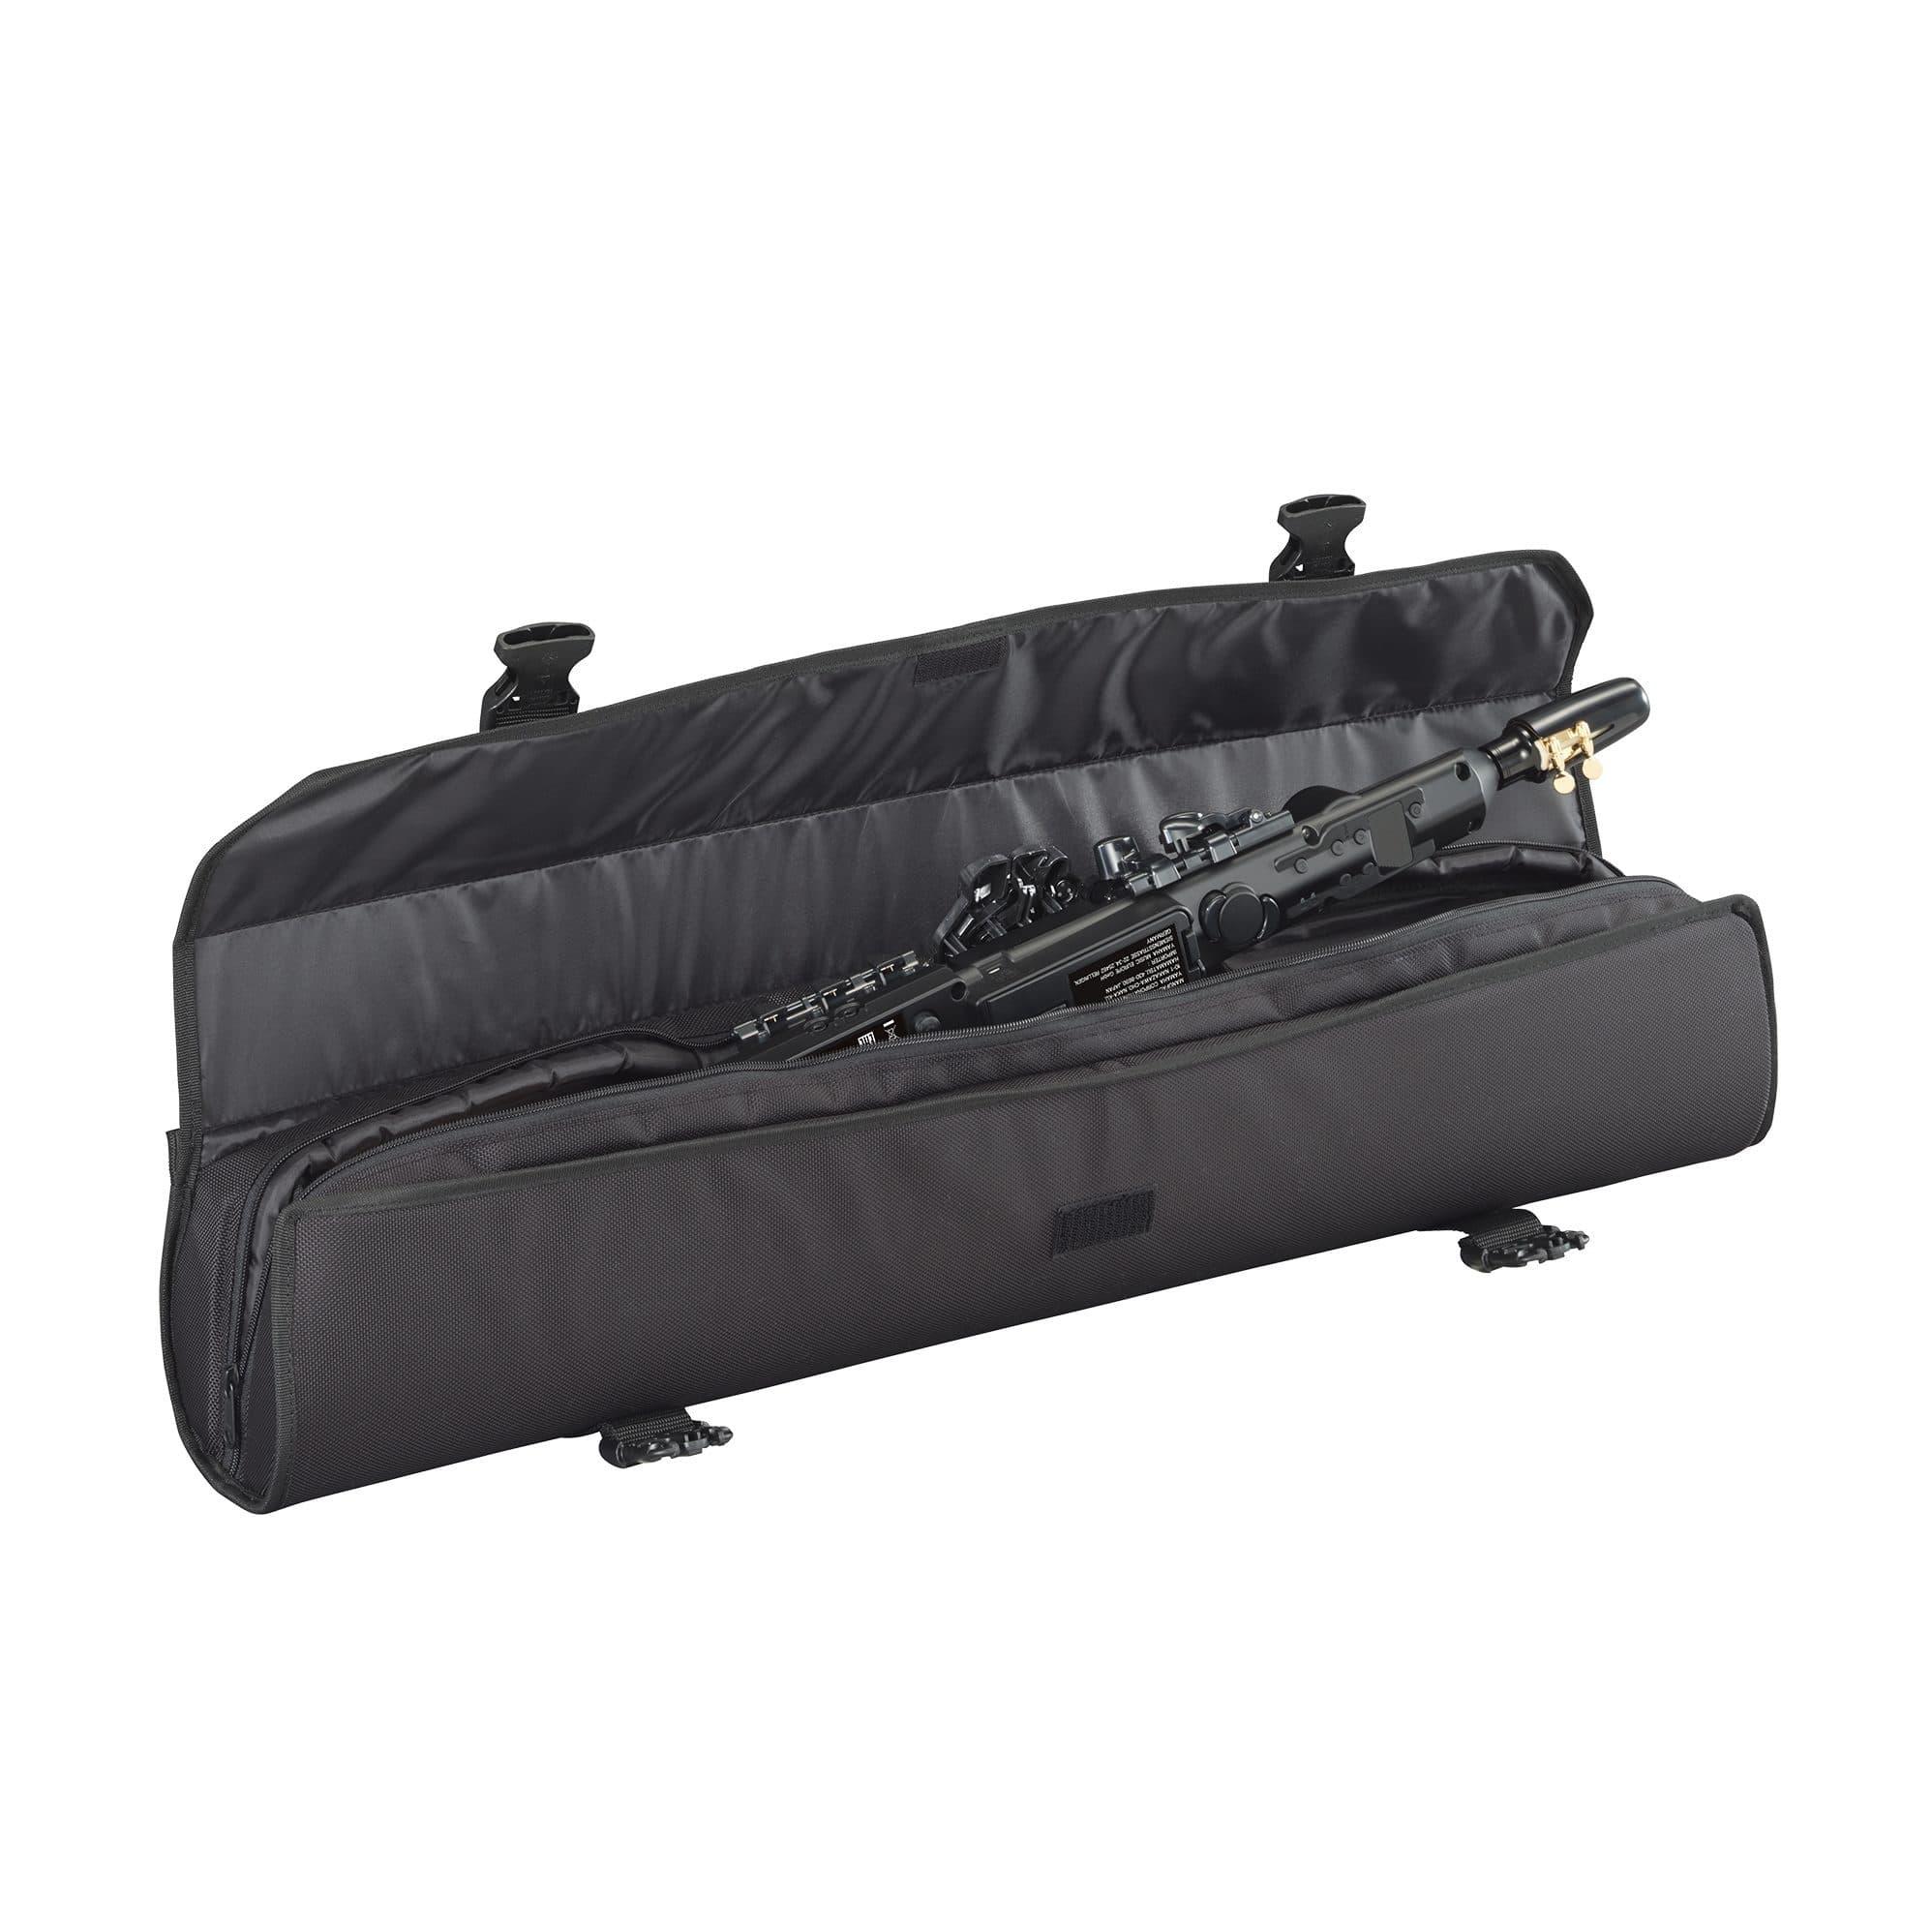 Digitalni saksofon YDS-150 v kompletu s kovčkom